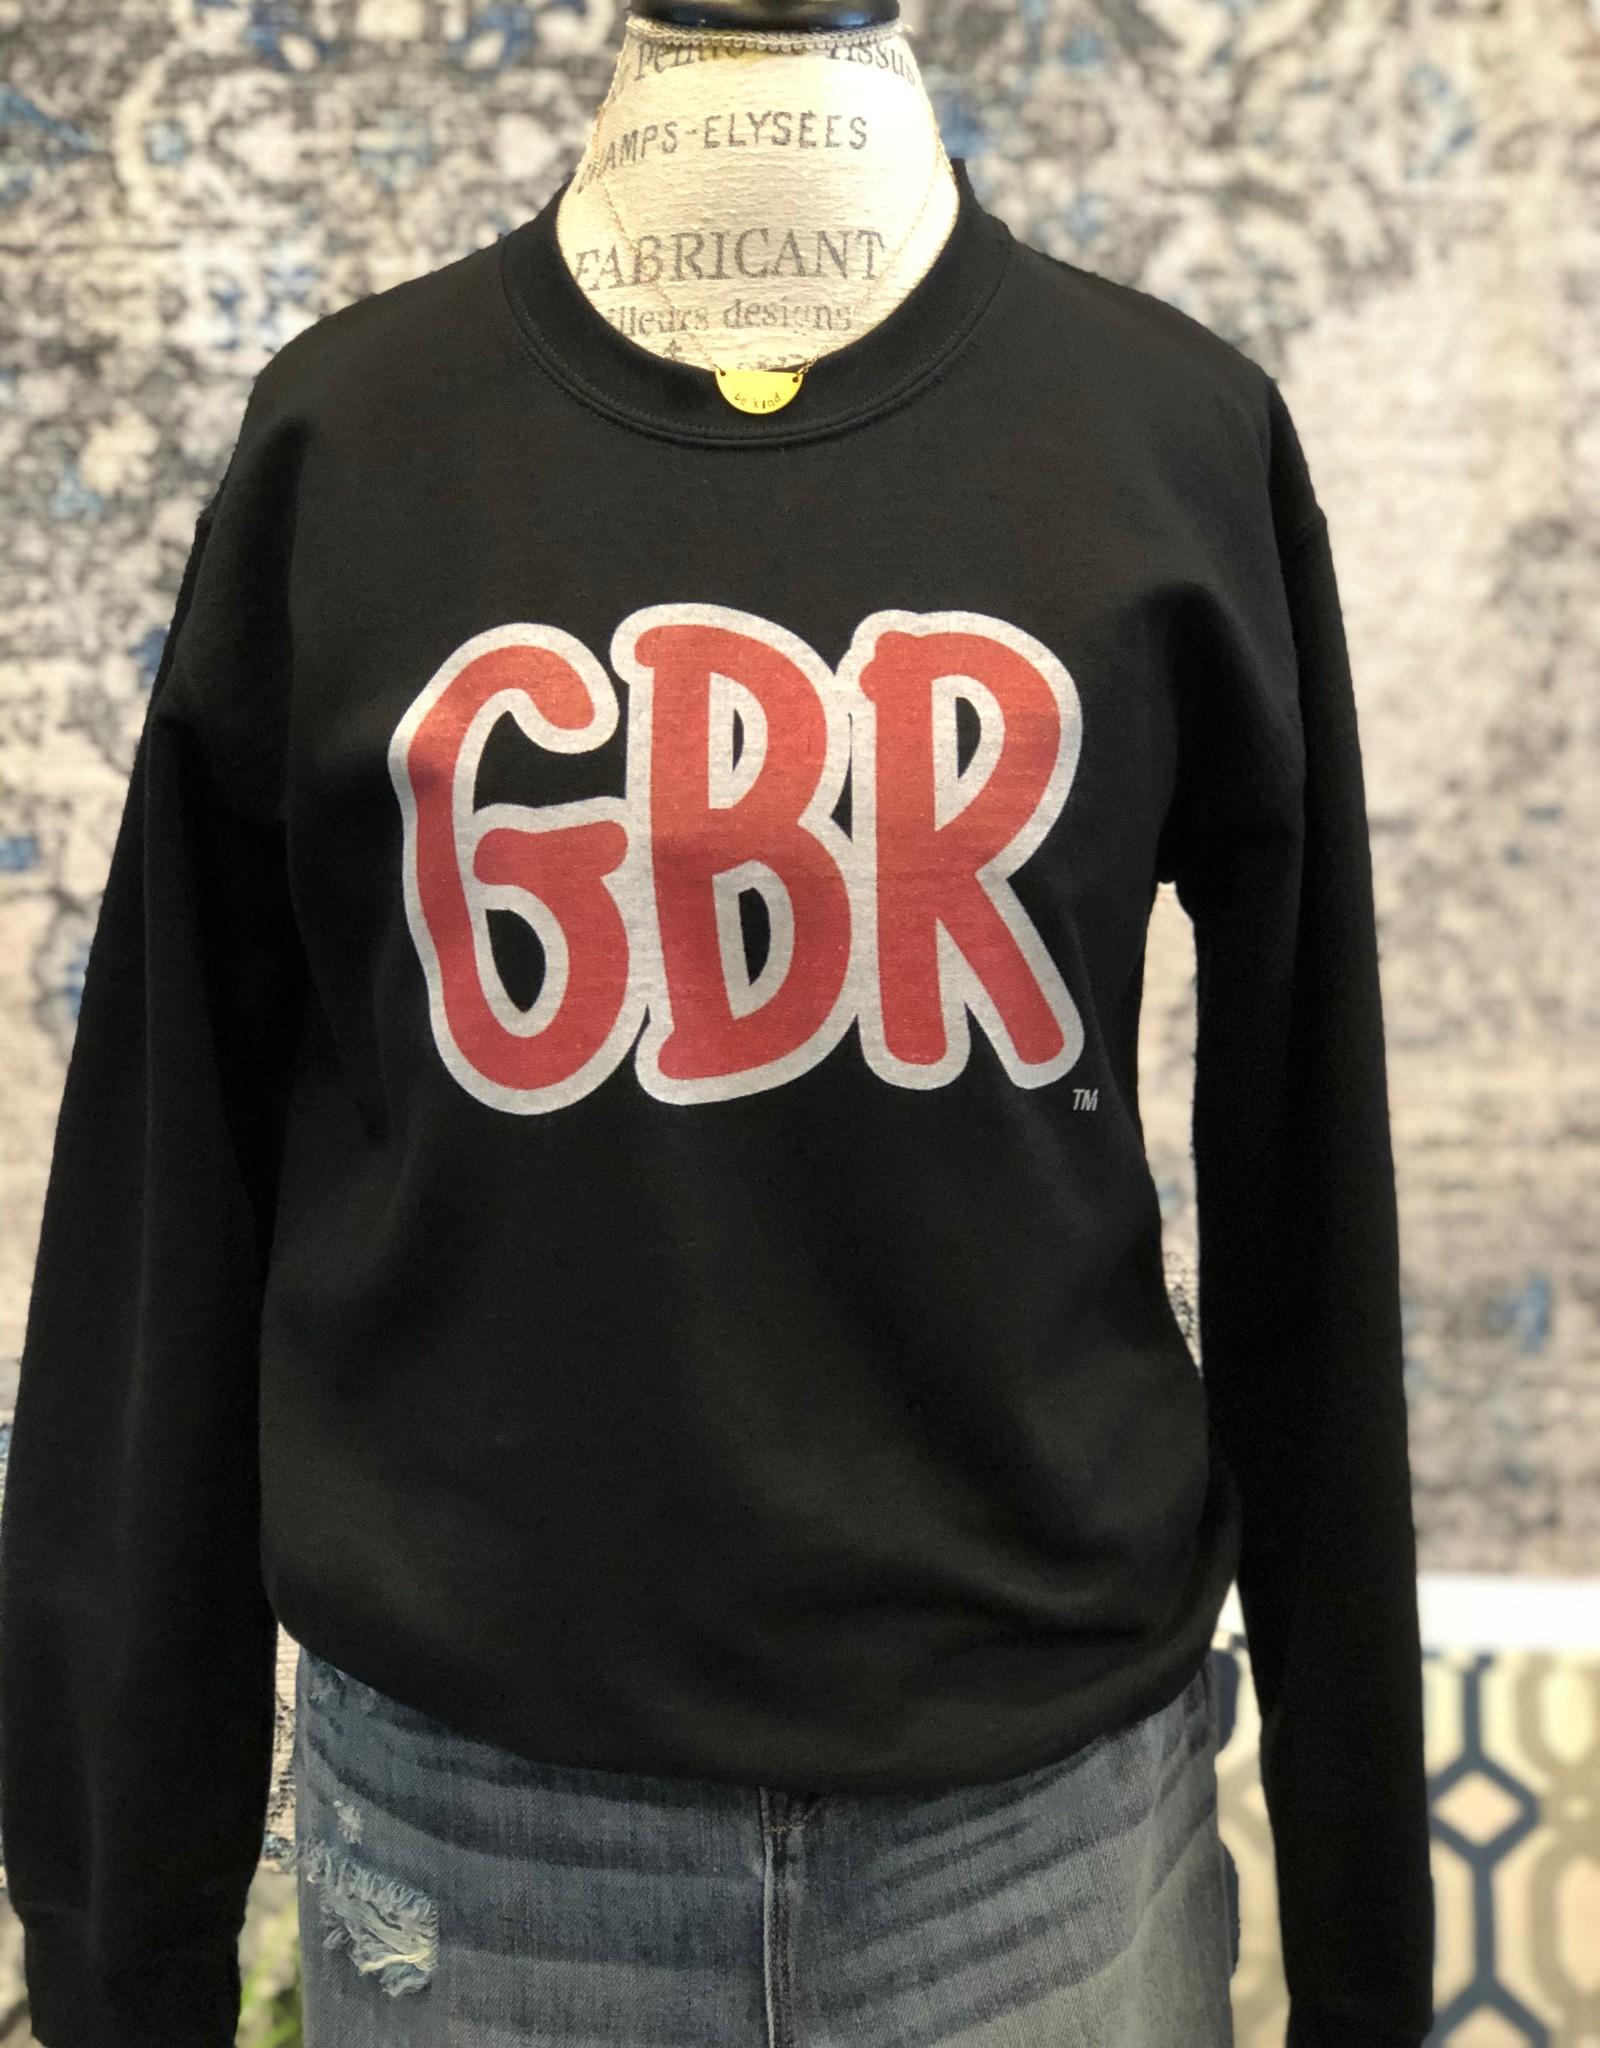 GBR Sweatshirt